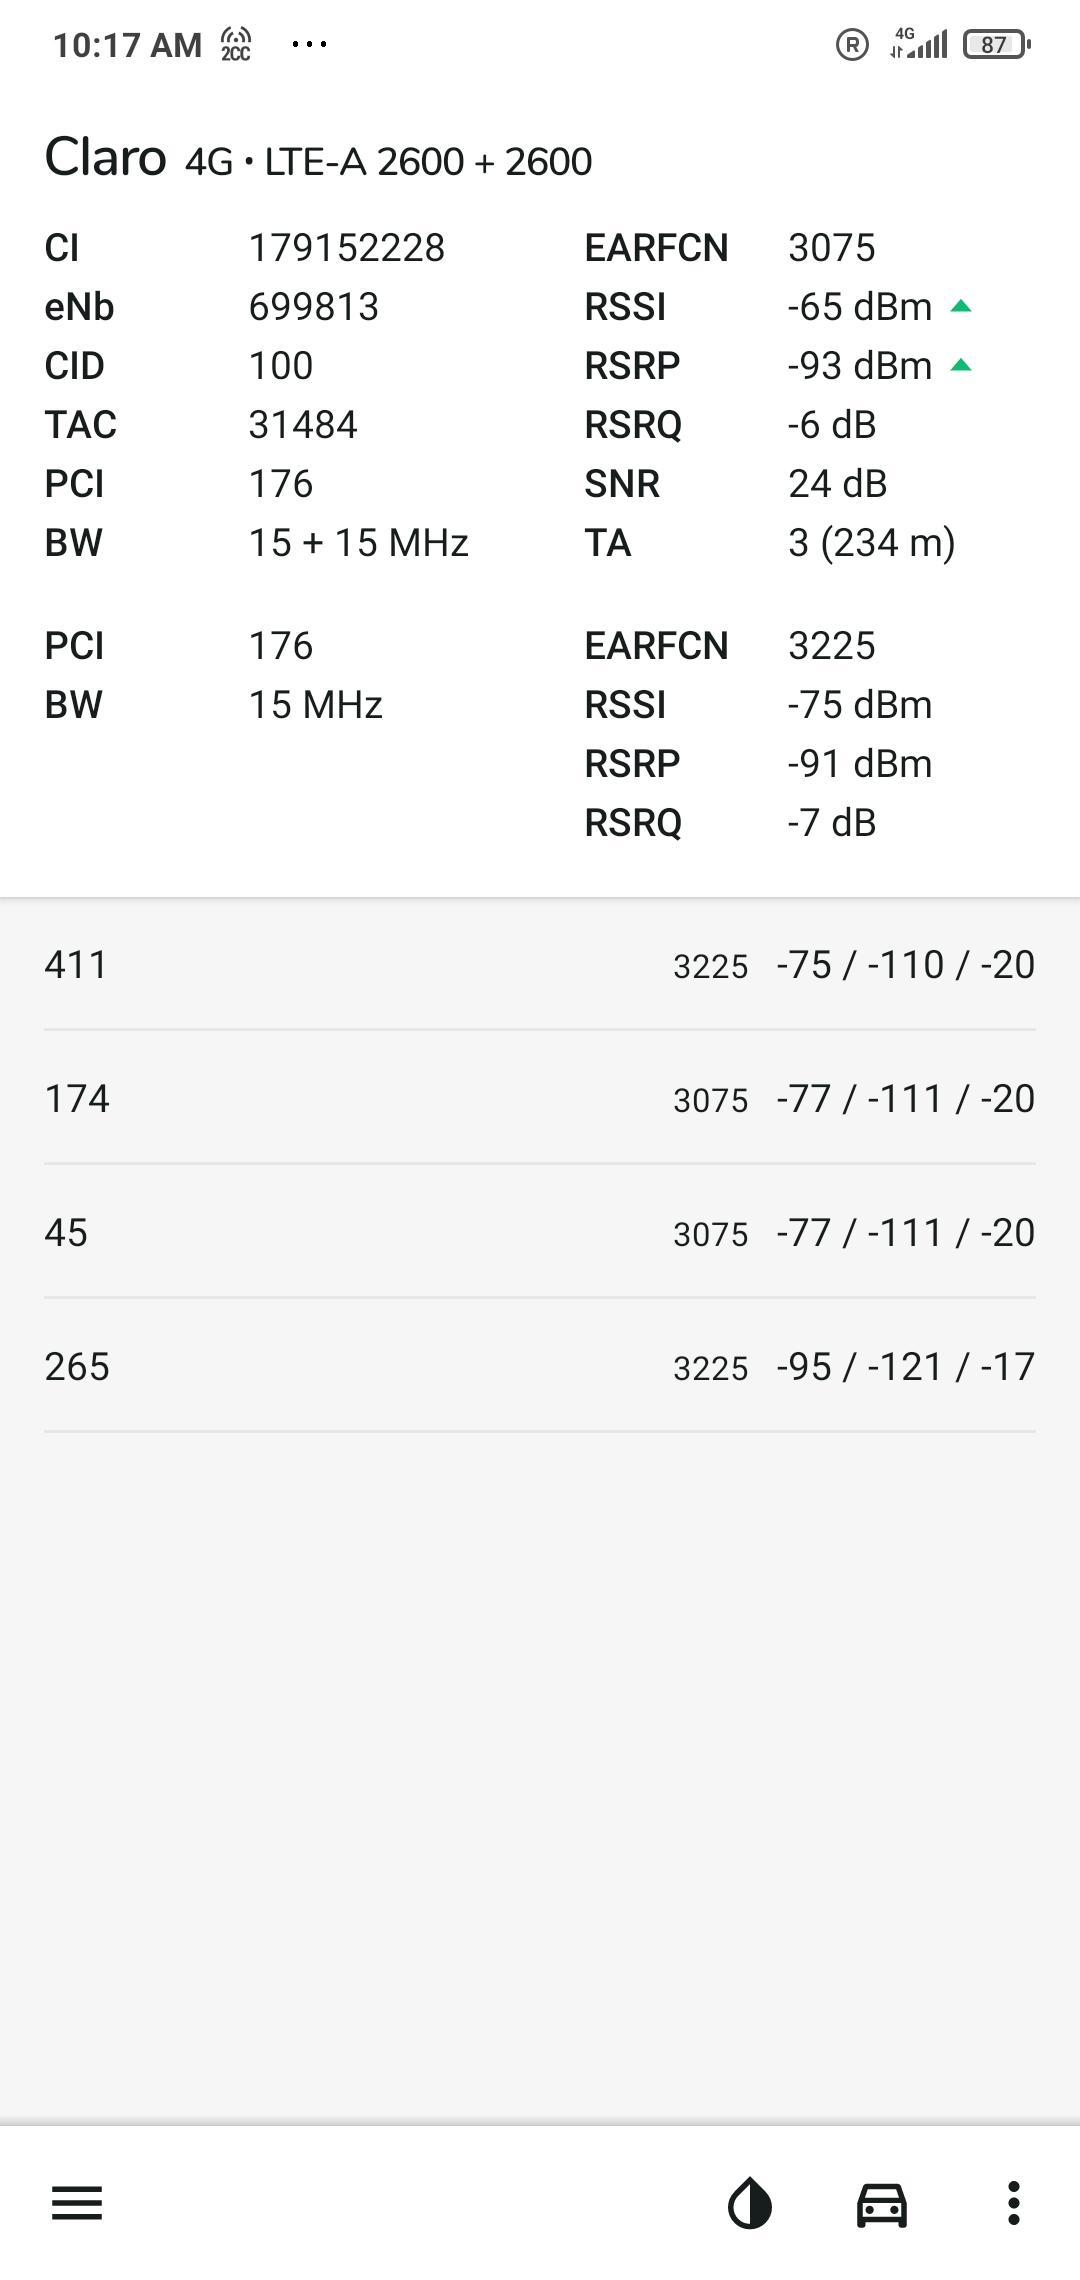 Screenshot_2021-01-14-10-17-13-133_cz.mroczis.netmonster.jpg